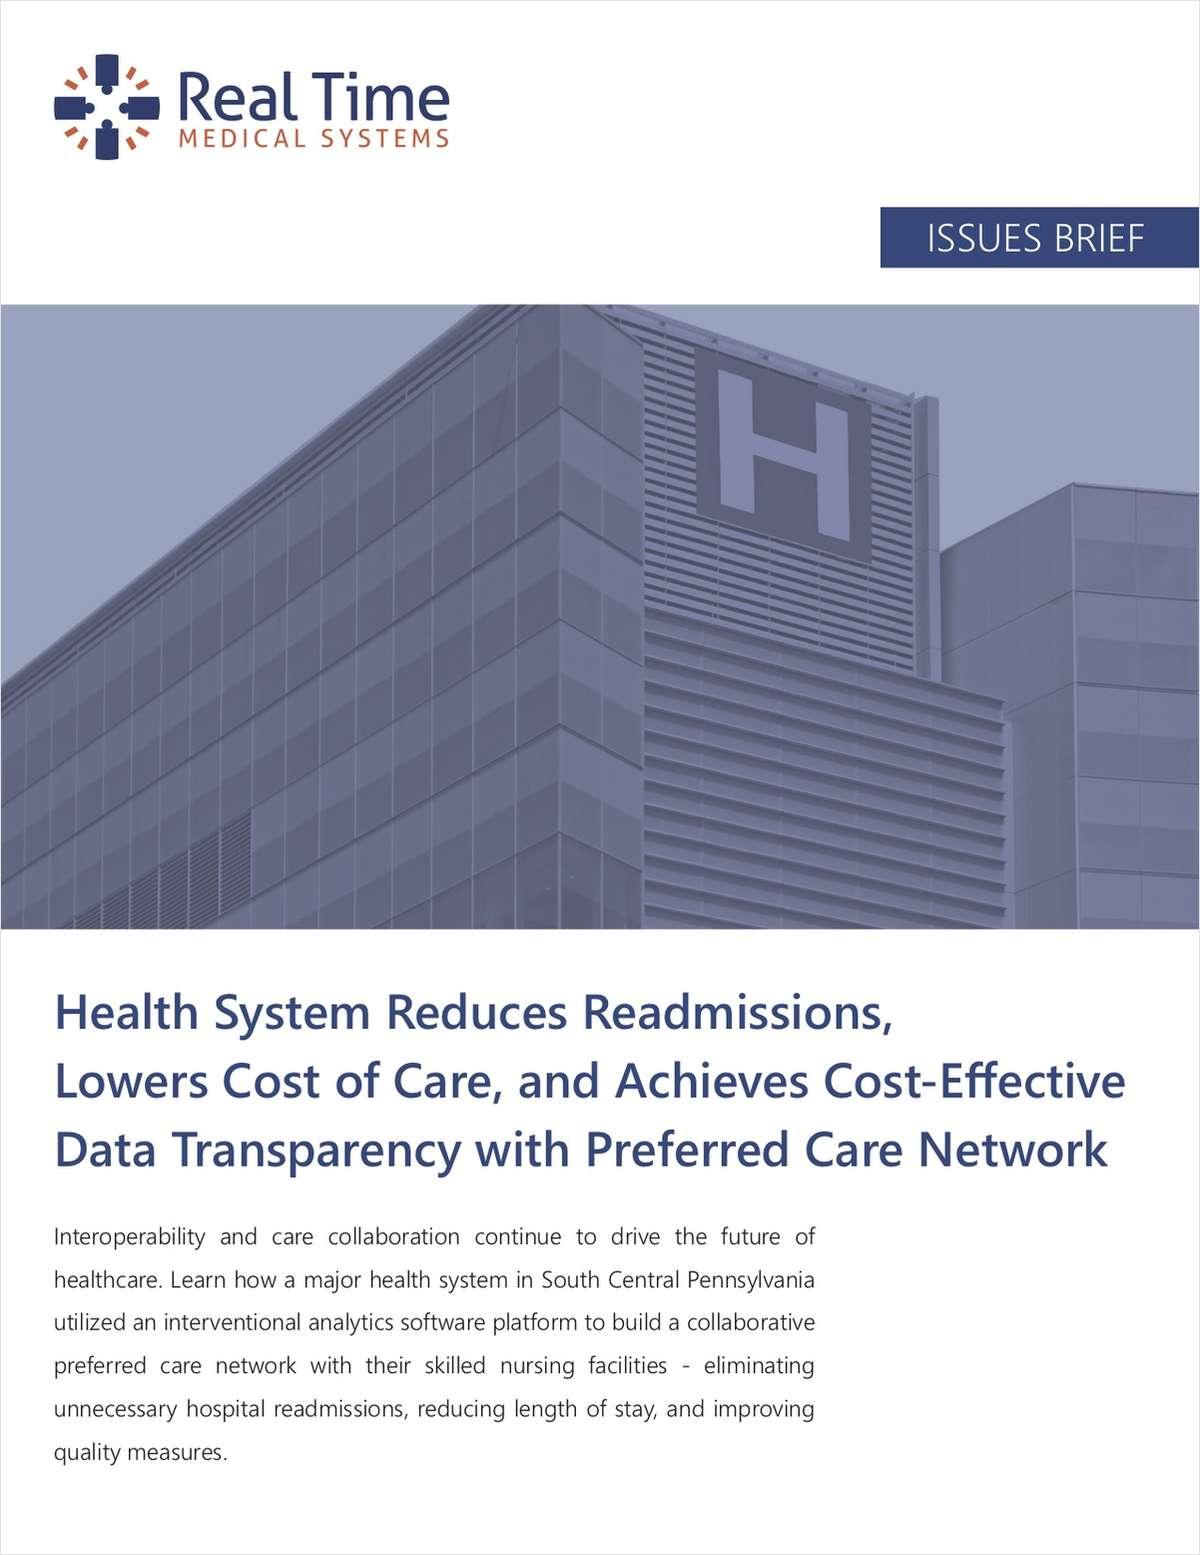 Achieving Post-Acute Interoperability to Improve Care Outcomes